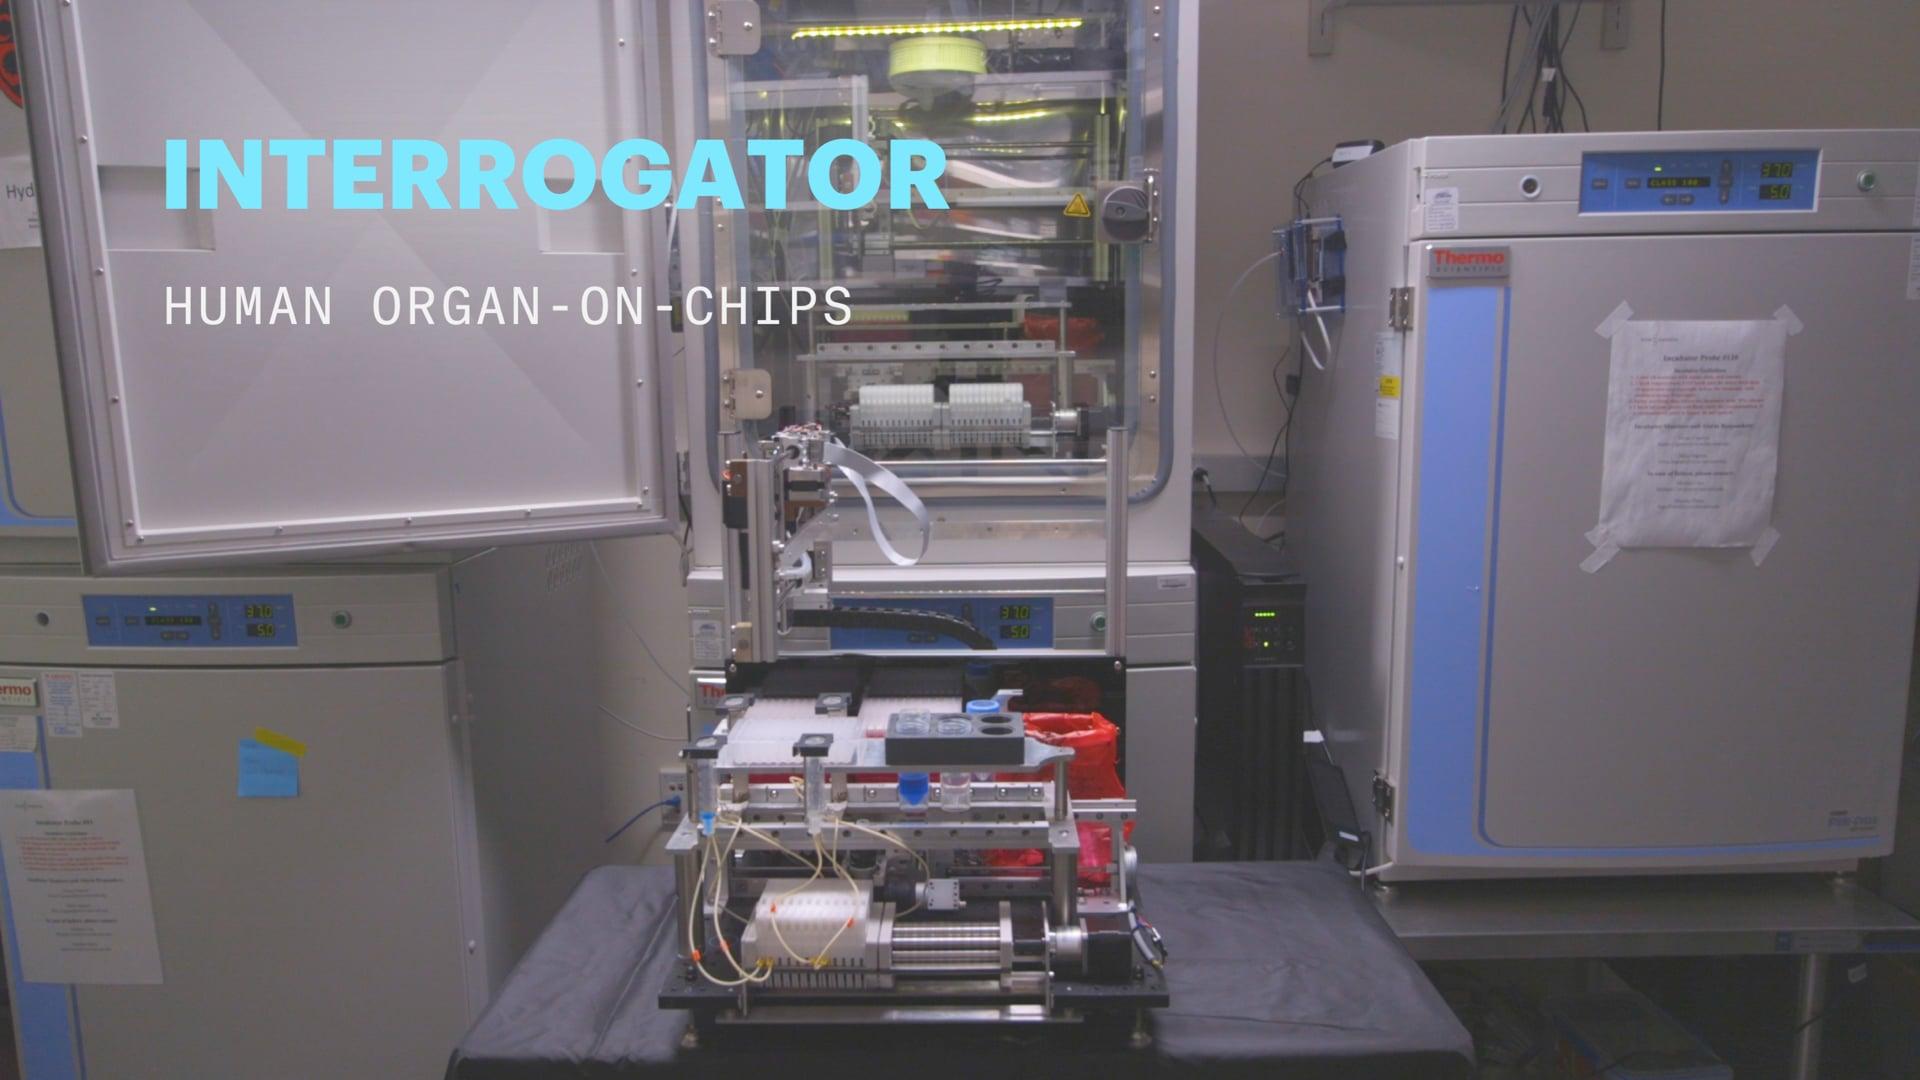 Interrogator: Human Organ-on-Chips